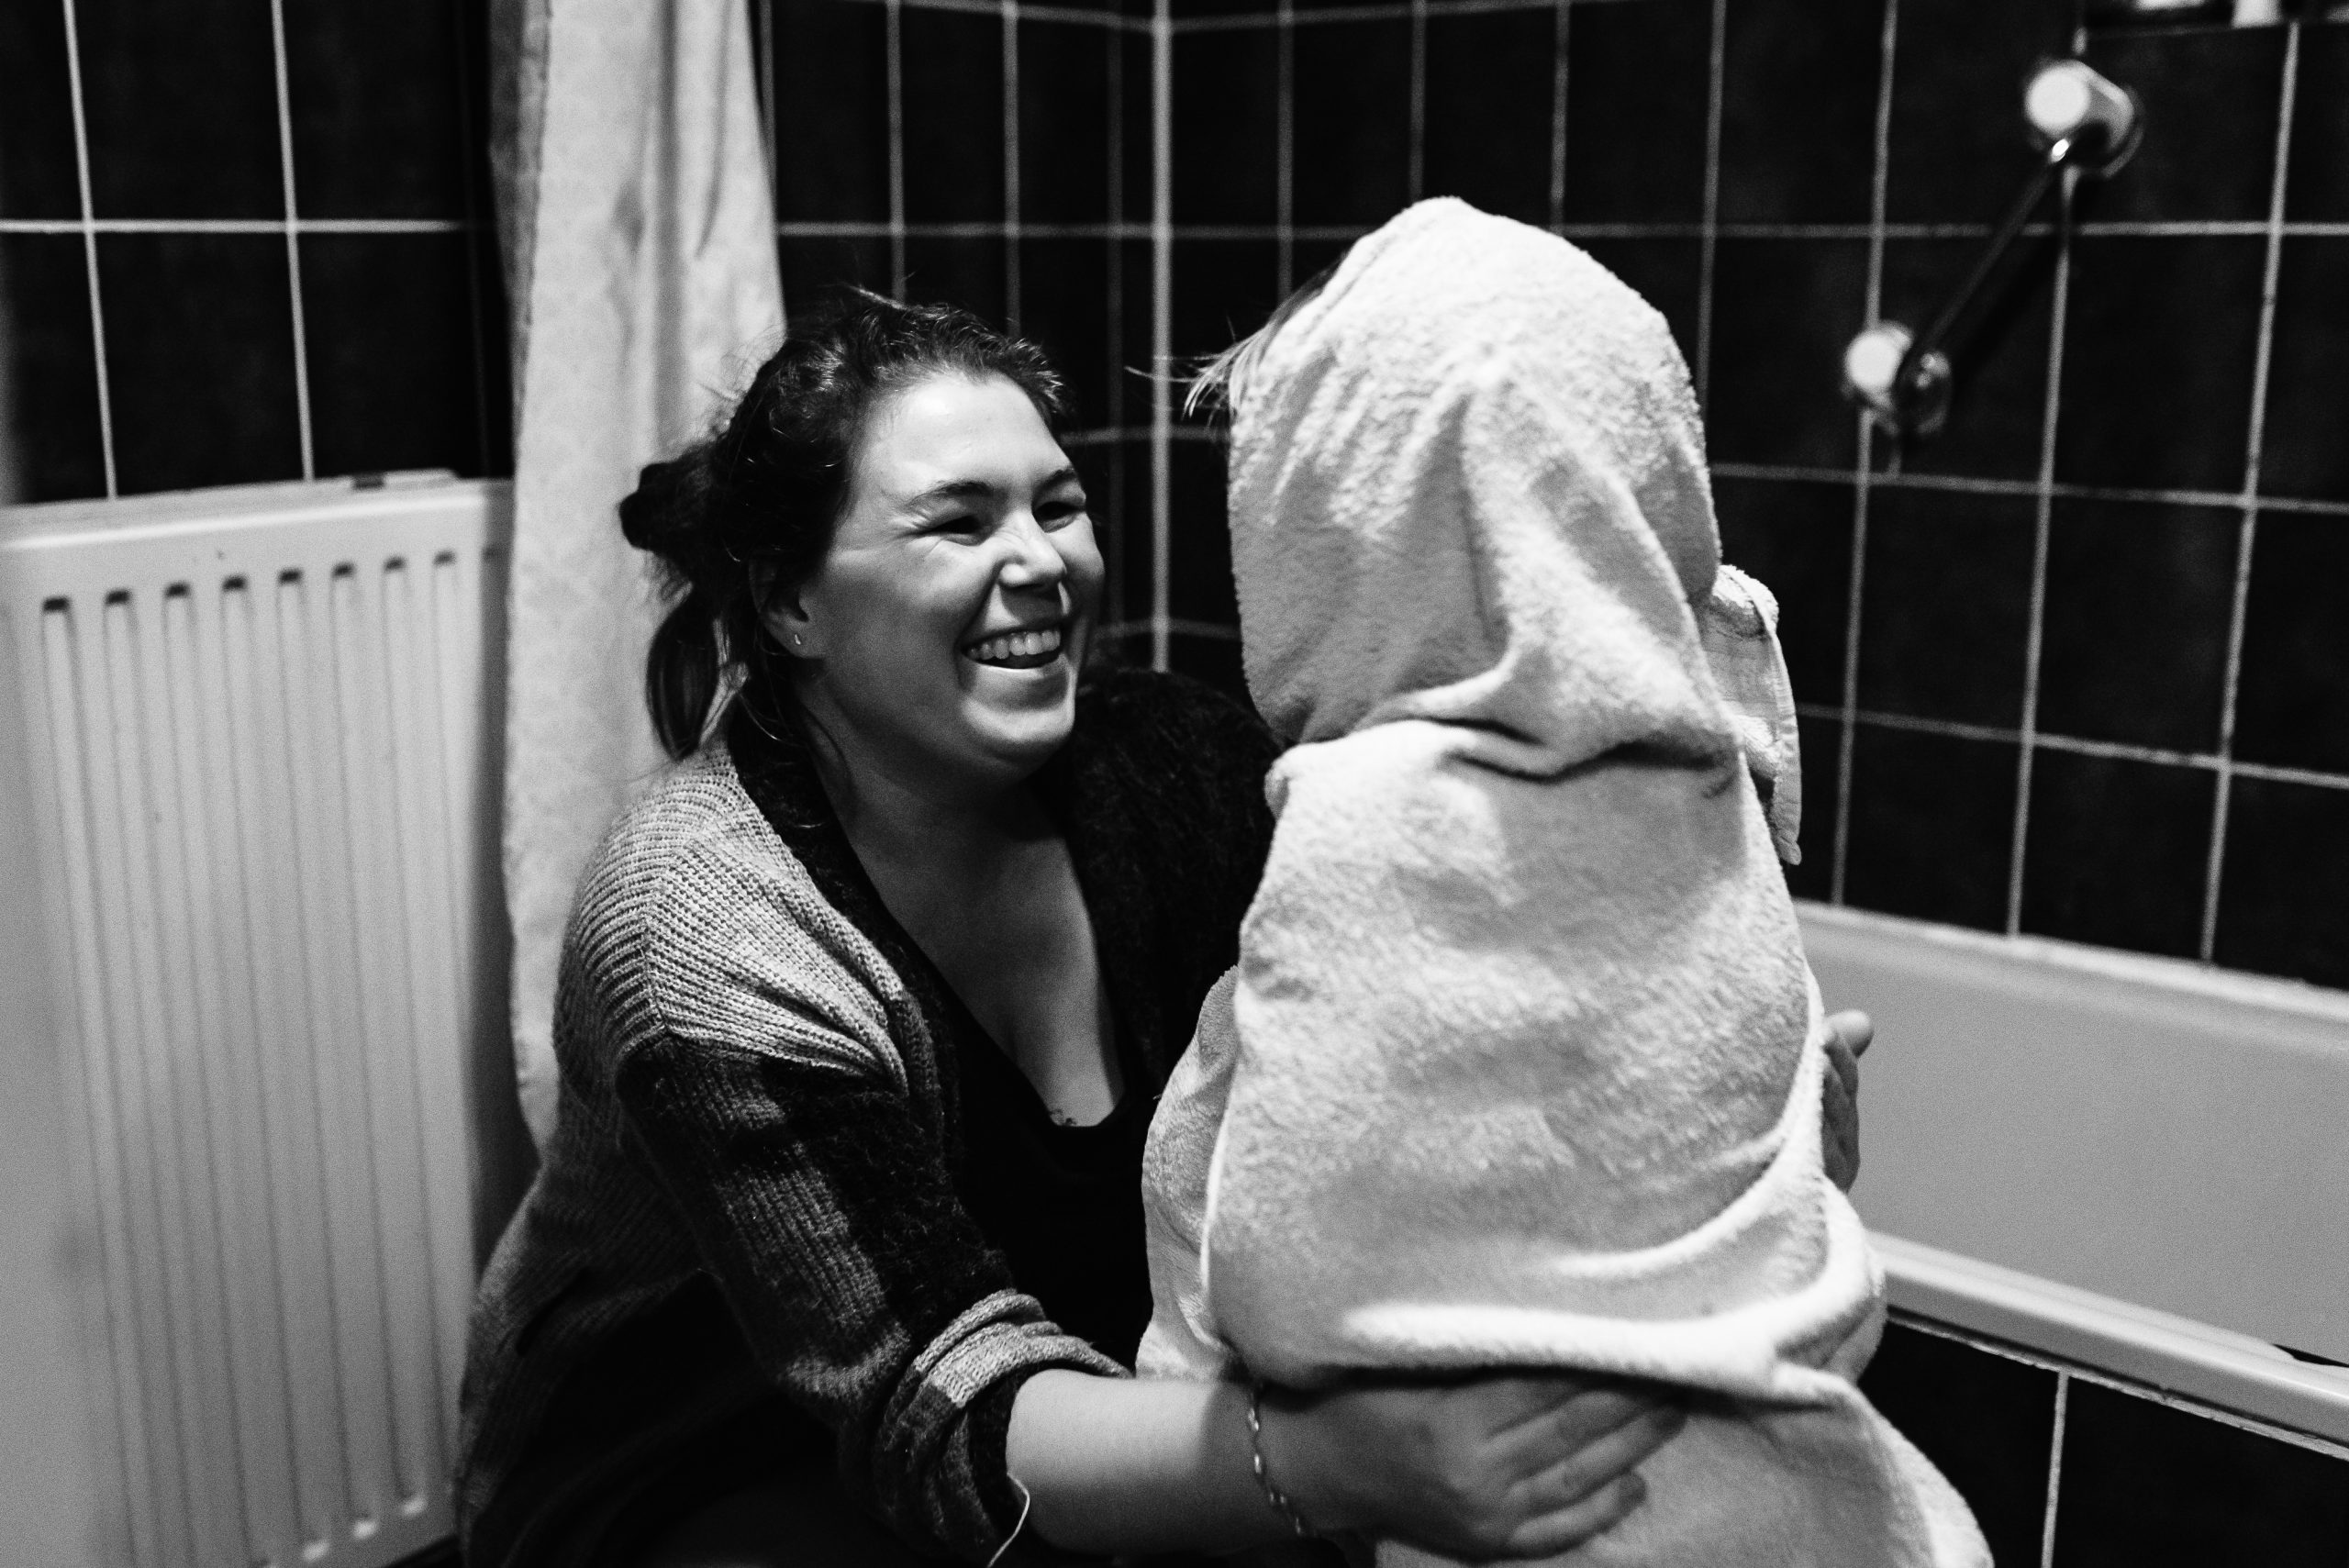 moeder kind moment, familiefotograaf Assen, gezinsfotograaf Assen, familiefotograaf Drenthe, gezinsfotograaf Drenthe, douche tafereel, zwart/wit fotografie